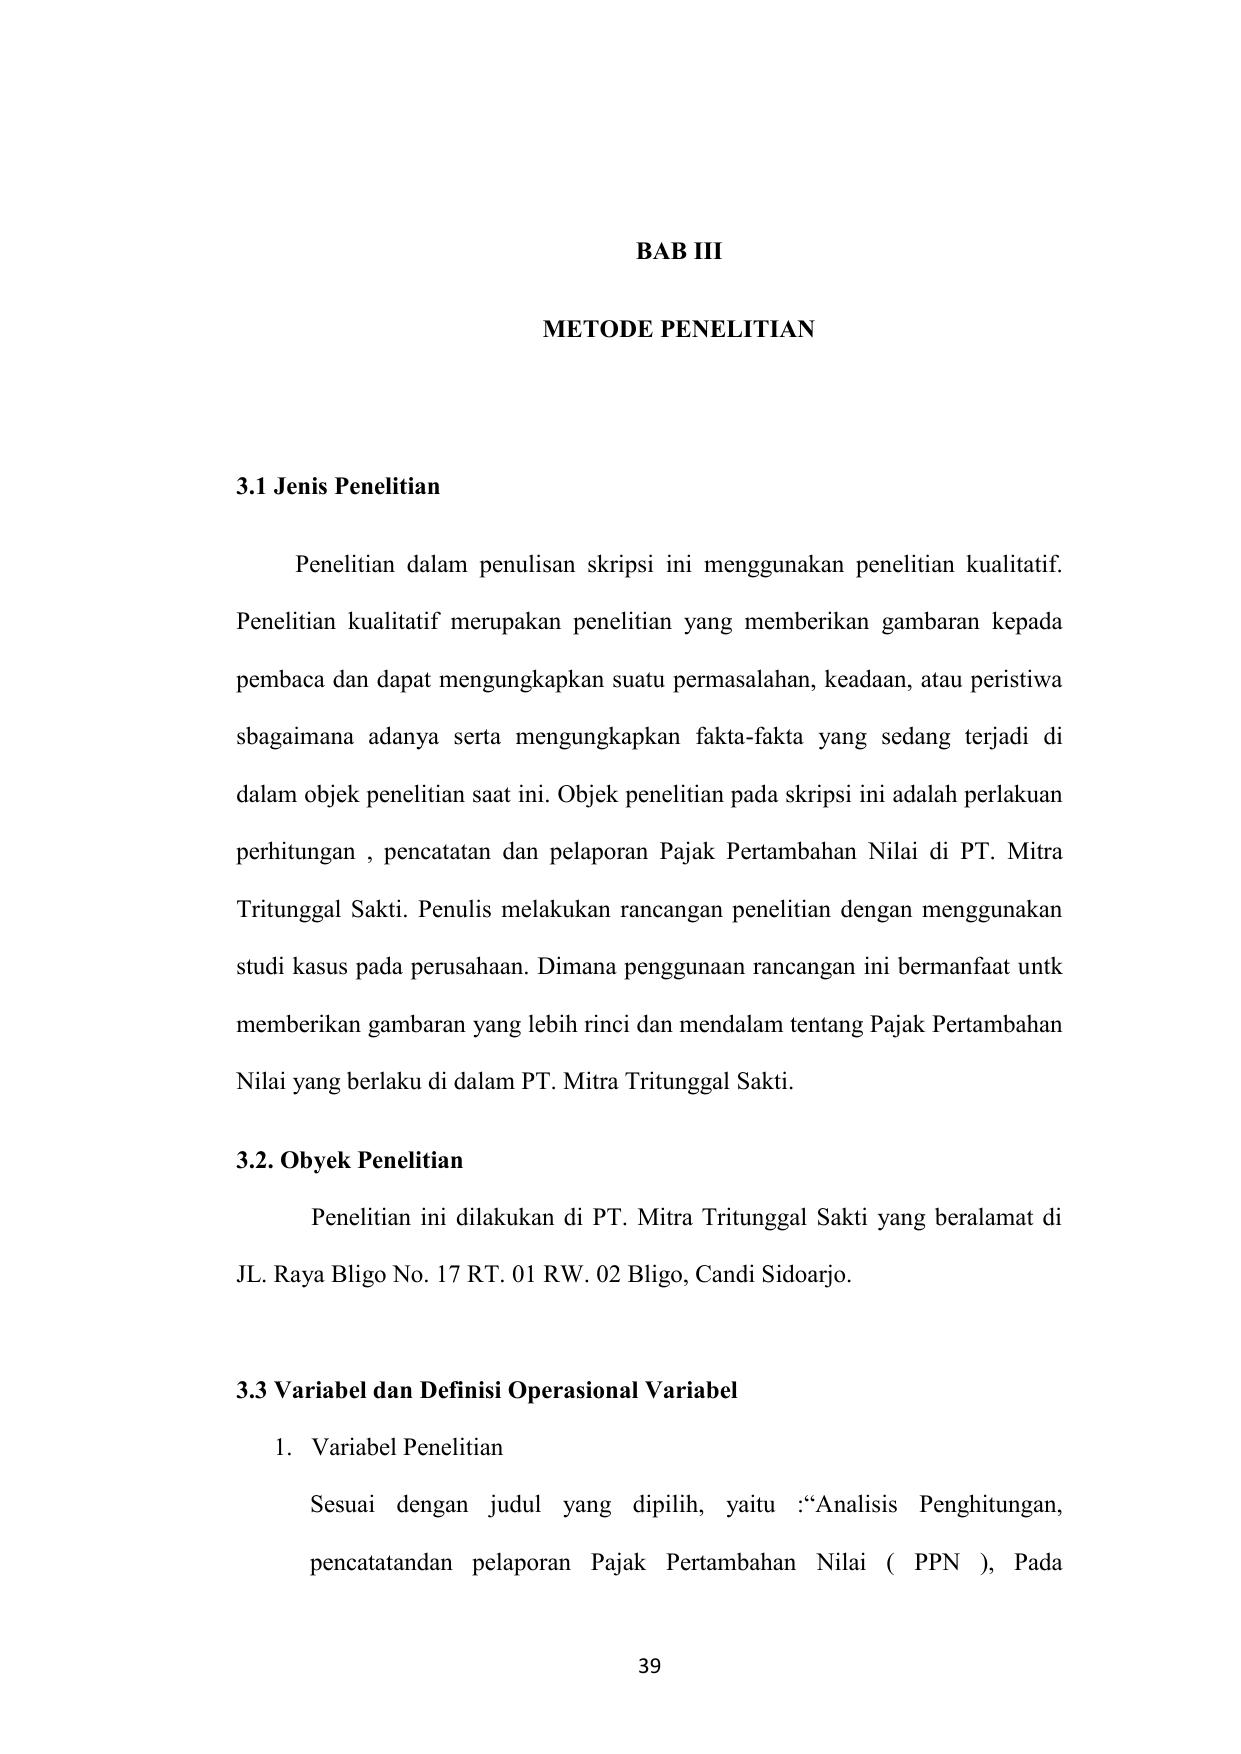 Contoh Tesis Kuantitatif 3 Variabel Contoh Soal Dan Materi